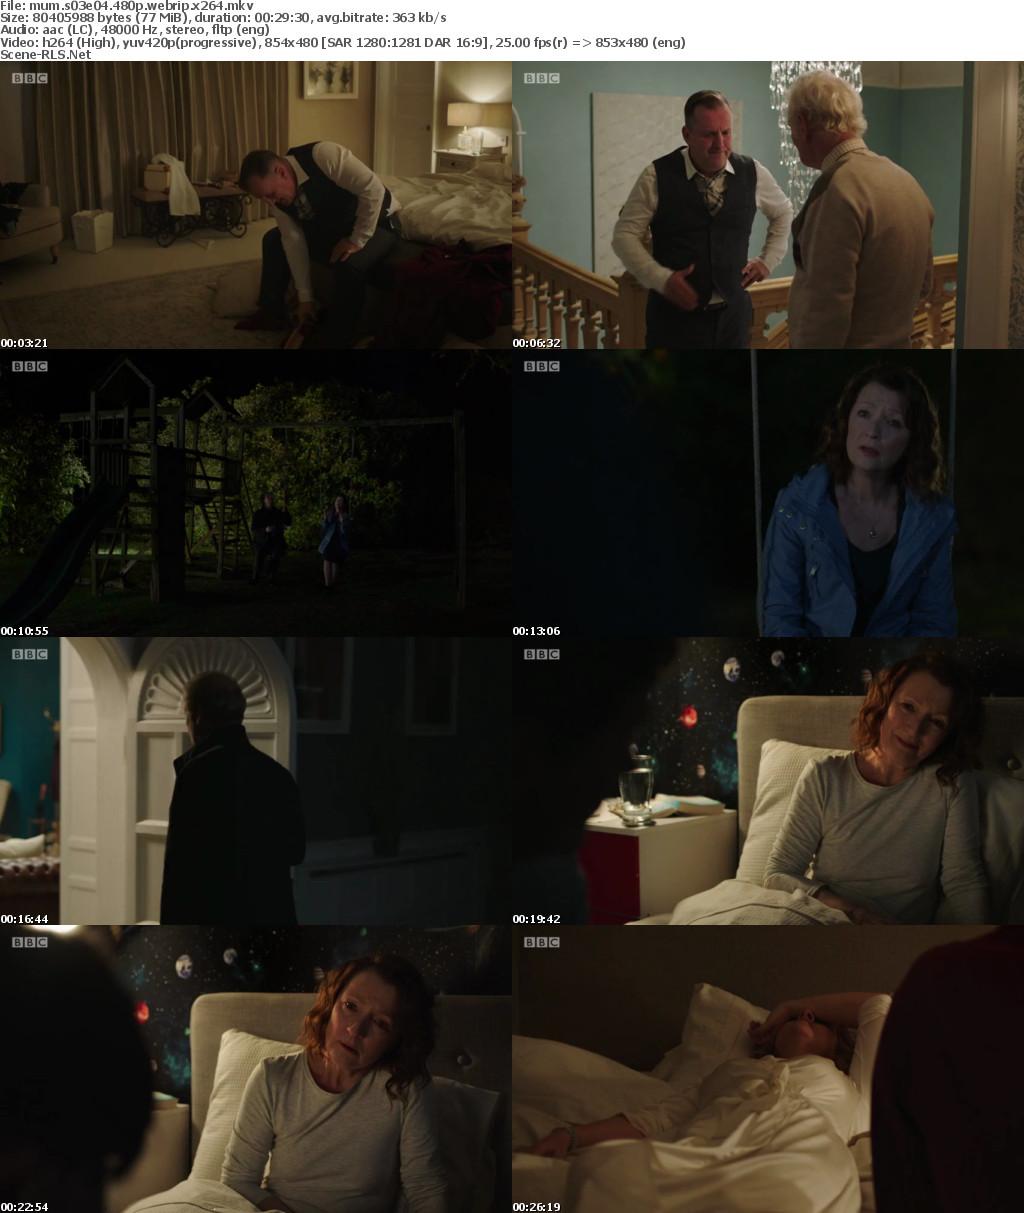 Mum S03E04 720p WEBRip x264-KOMPOST - Scene Release